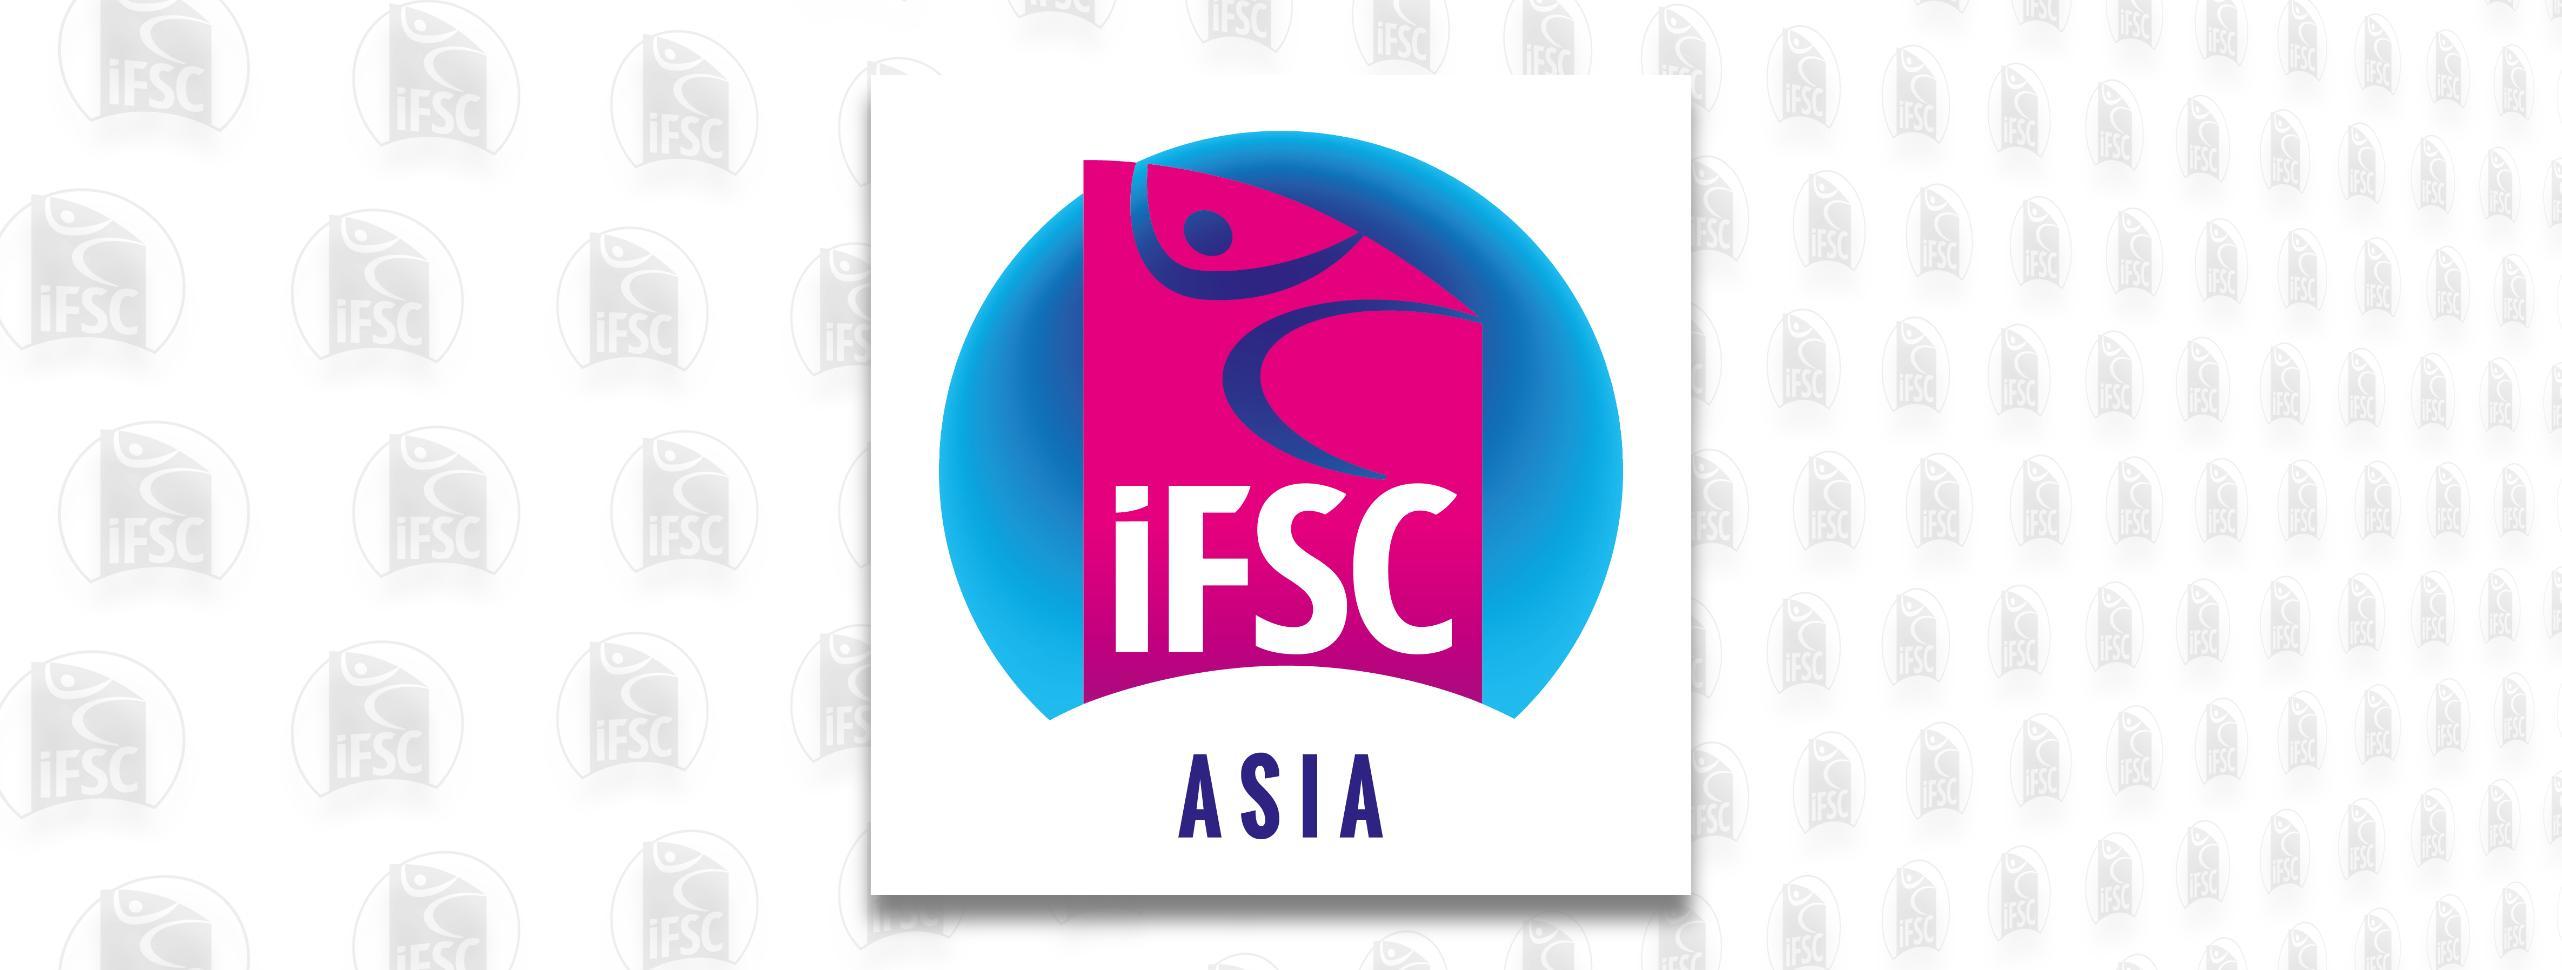 ZHIXIN LI ELECTED PRESIDENT OF THE IFSC ASIAN COUNCIL